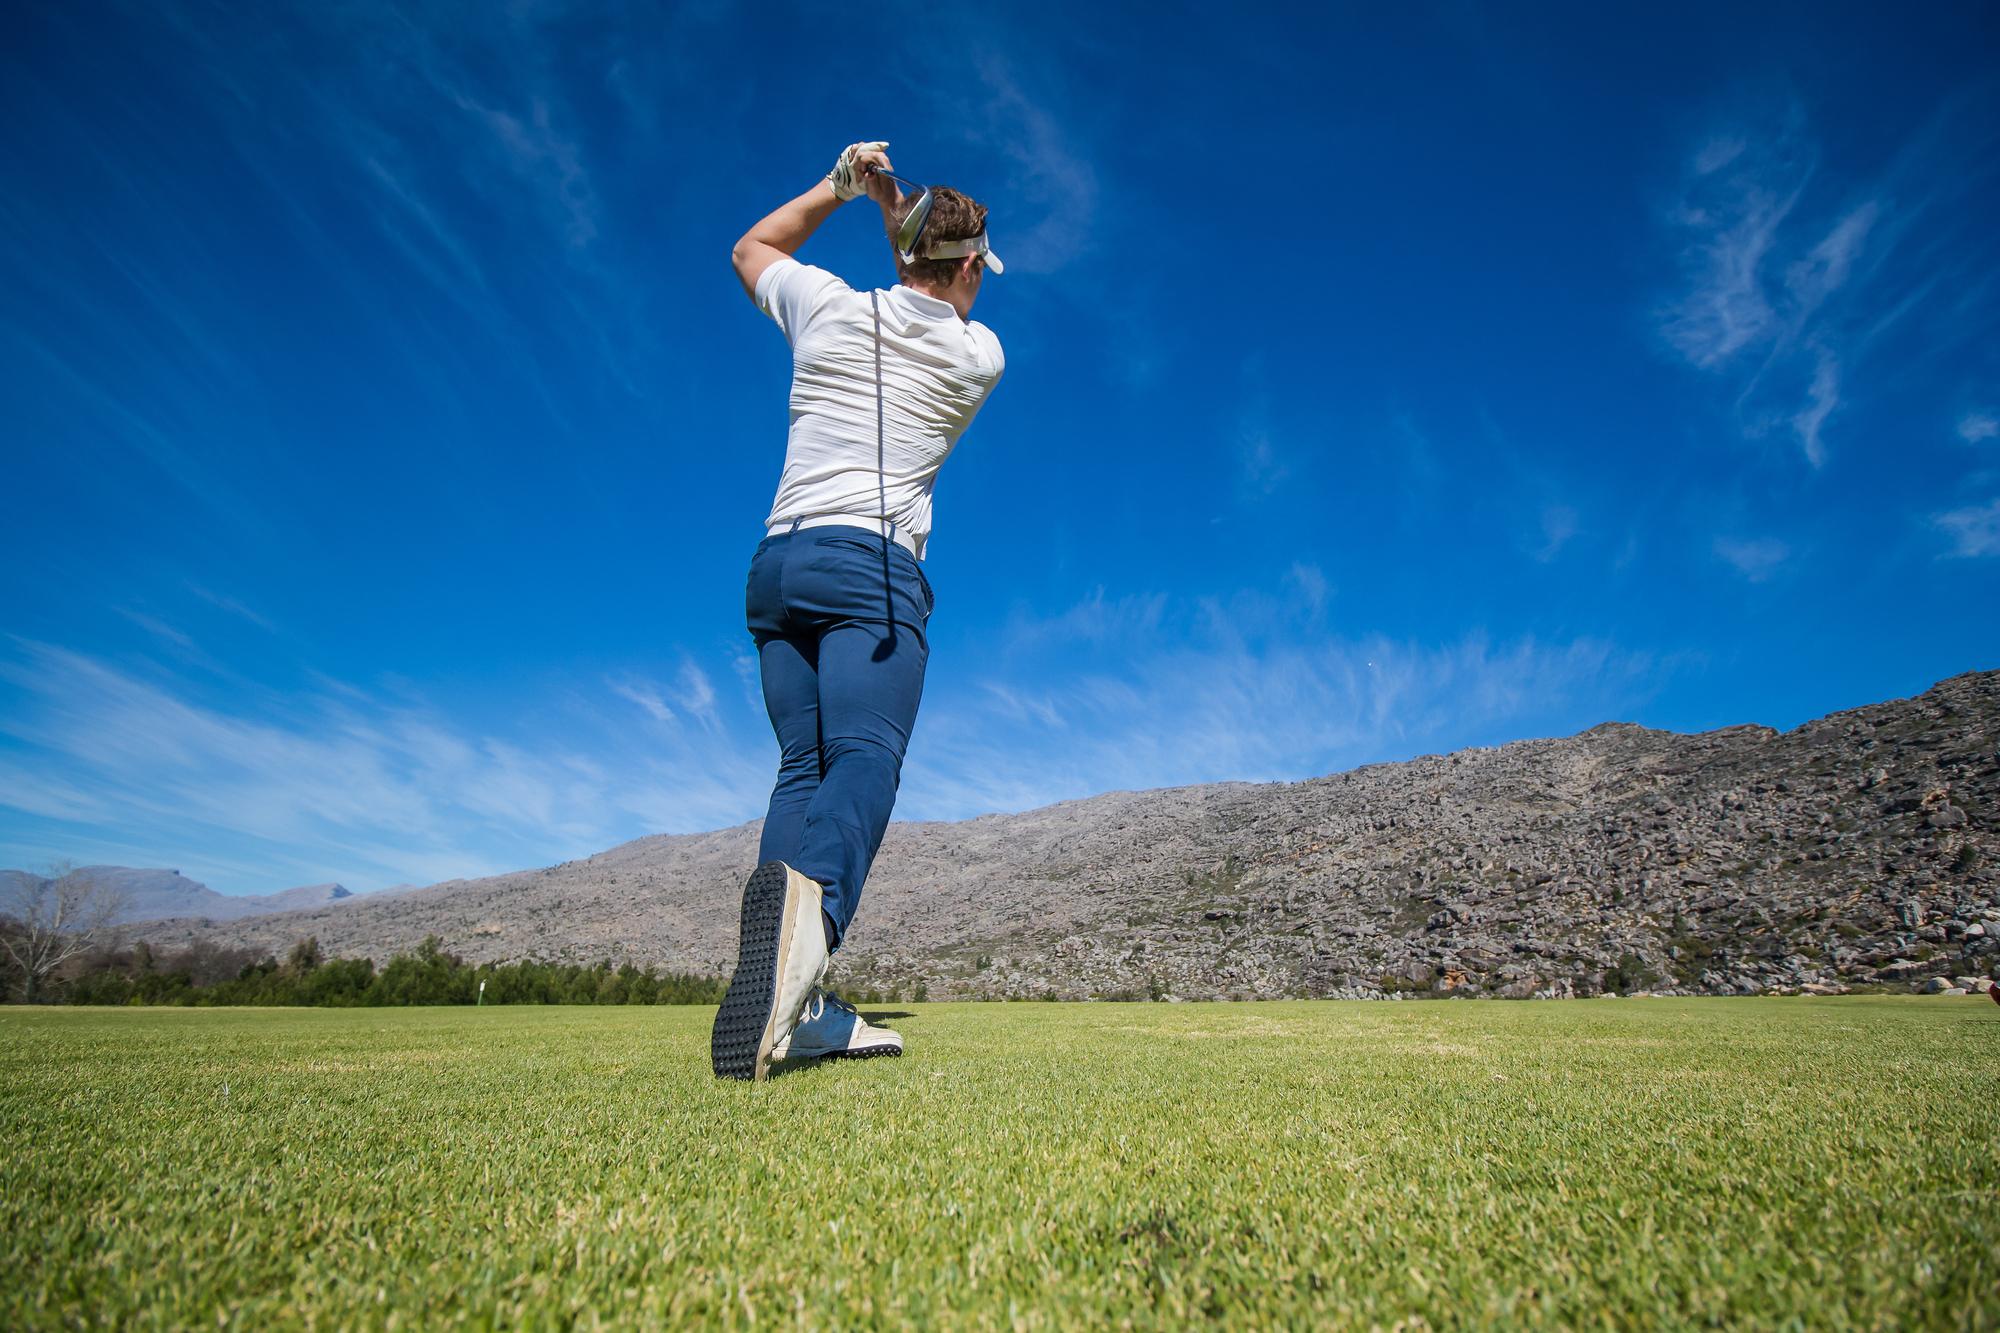 PARC Employees Participate in Memorial Golf Tournament